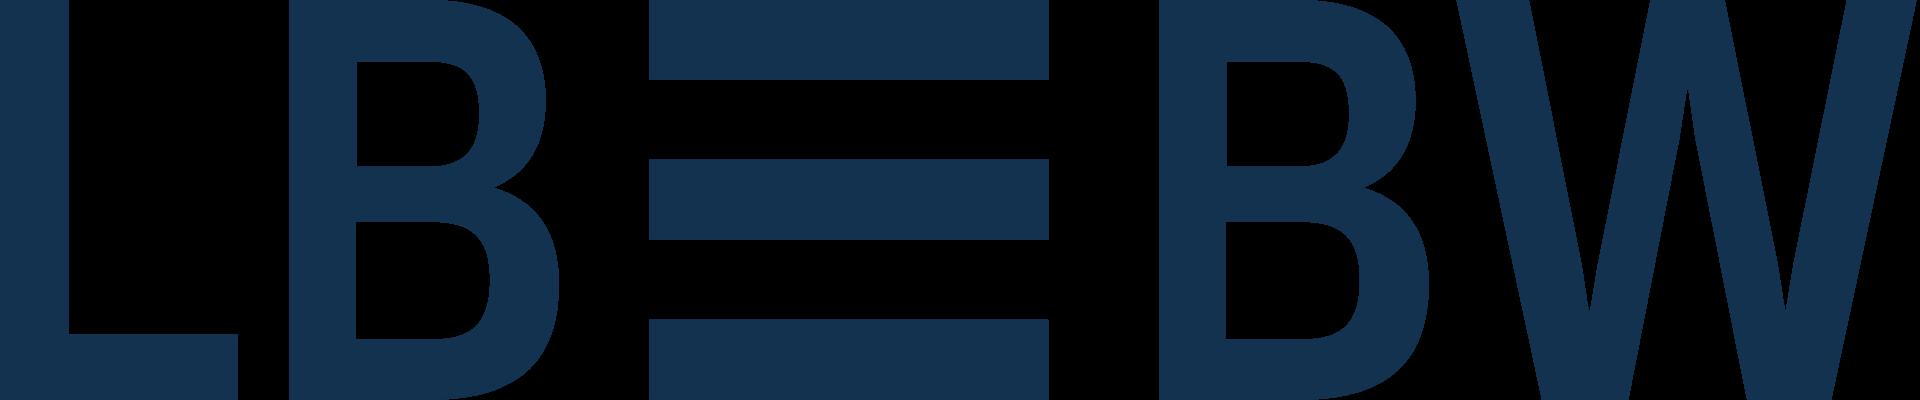 LBEBW Logo